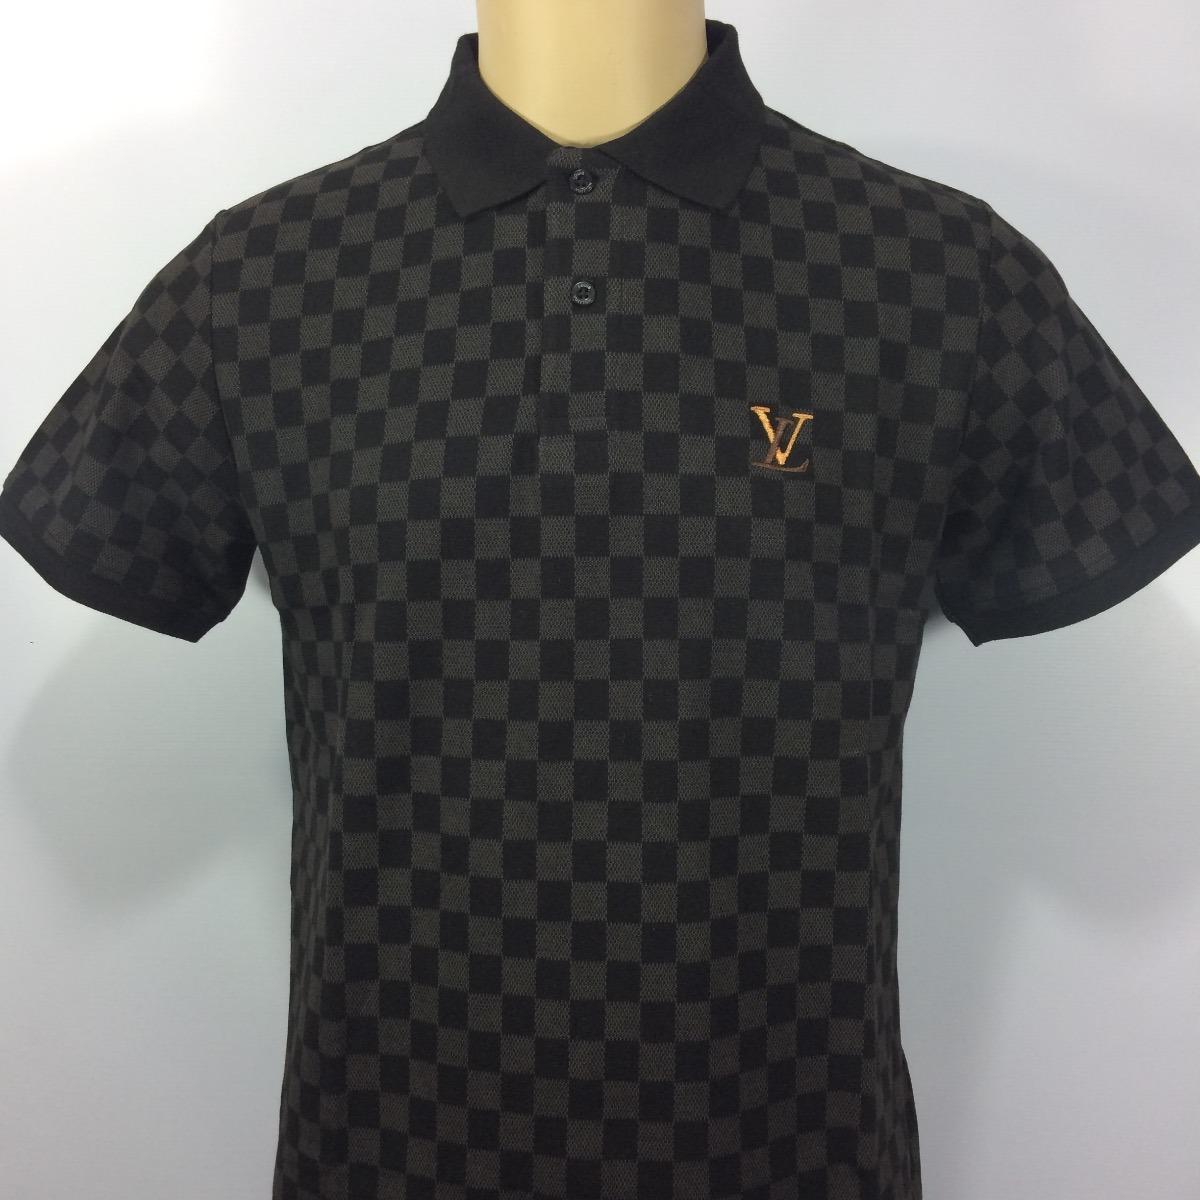 30d571f9b camisa polo louis vuitton xadrez clássica com etiquetas. Carregando zoom.